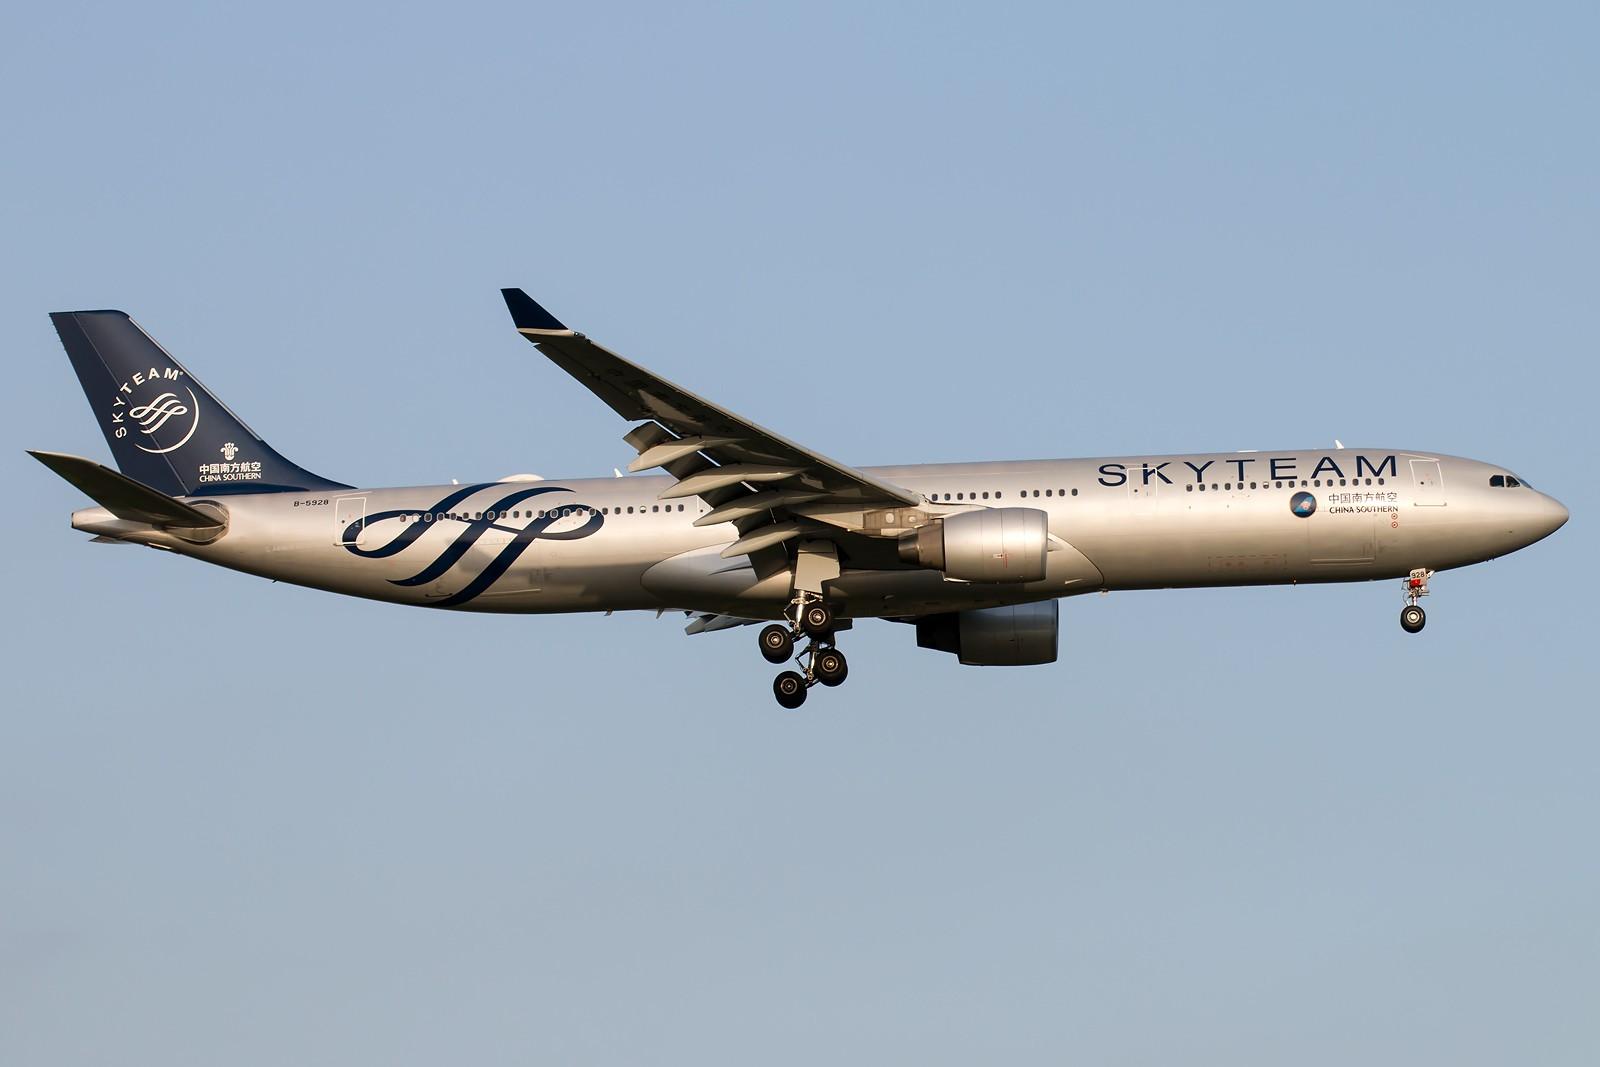 Re:[原创]晨练的季节到了 1600*1067 [8pics] AIRBUS A330-323 B-5928 中国北京首都国际机场